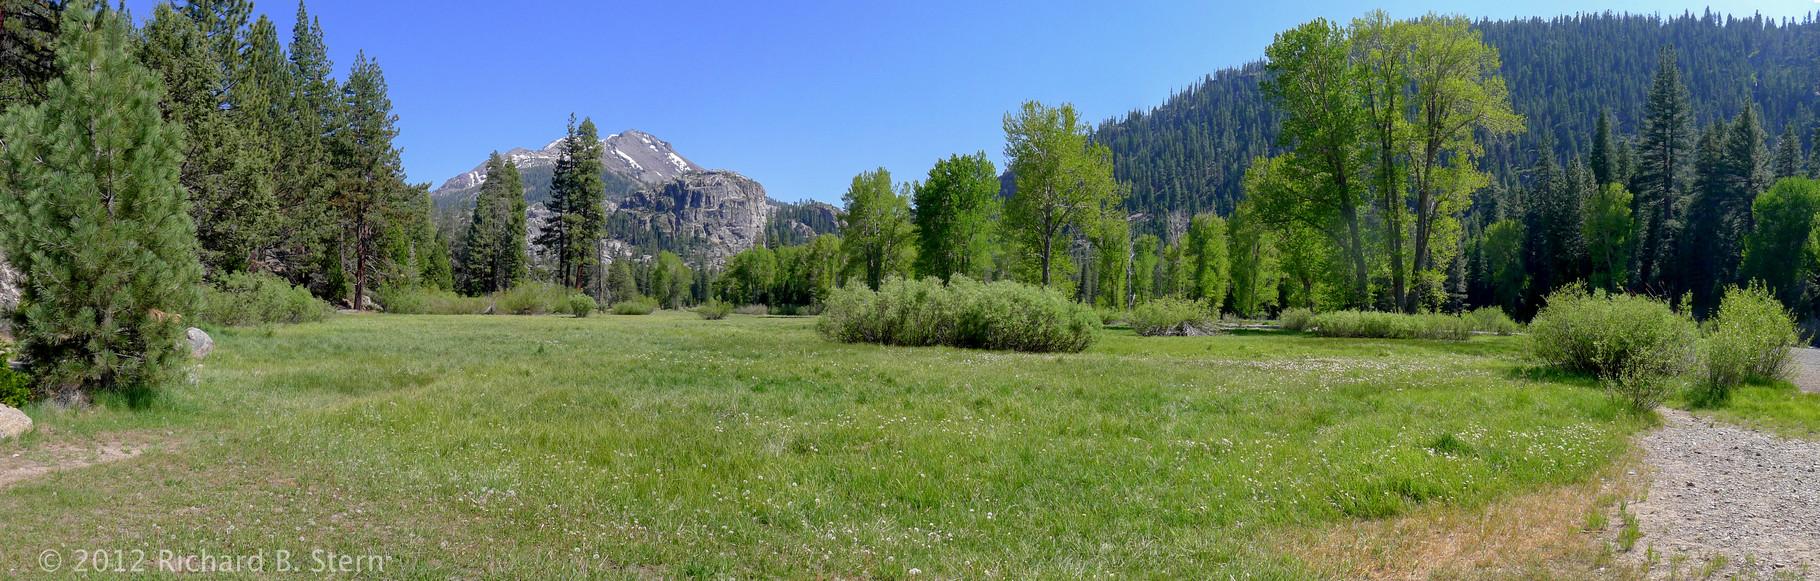 Kennedy Meadows & Lane Lake Backpack Trip